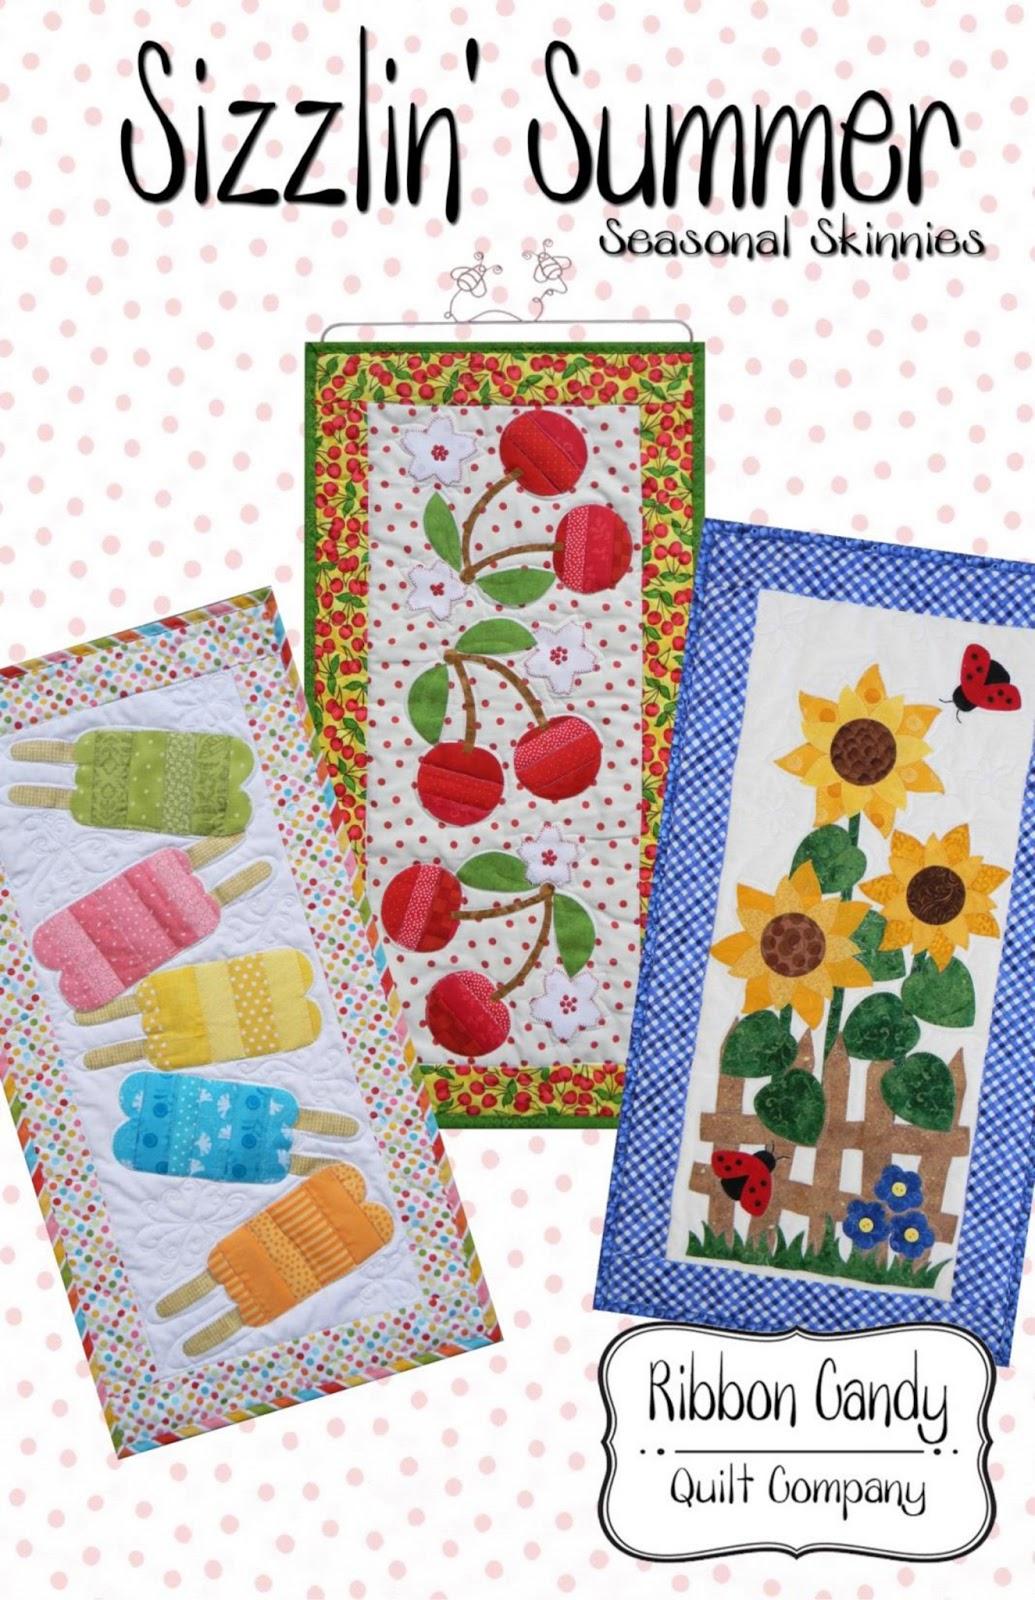 Ribbon Candy Quilt Company: Seasonal Skinnies Patterns : ribbon candy quilt - Adamdwight.com